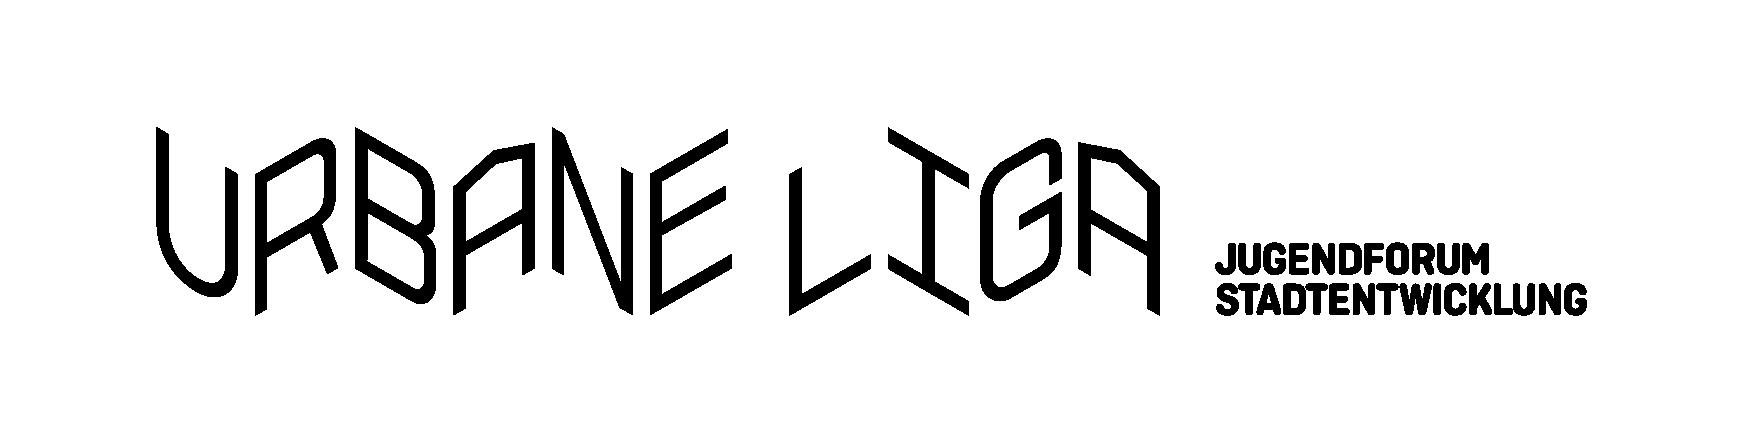 180328 Urbane Liga Logo Rz 02